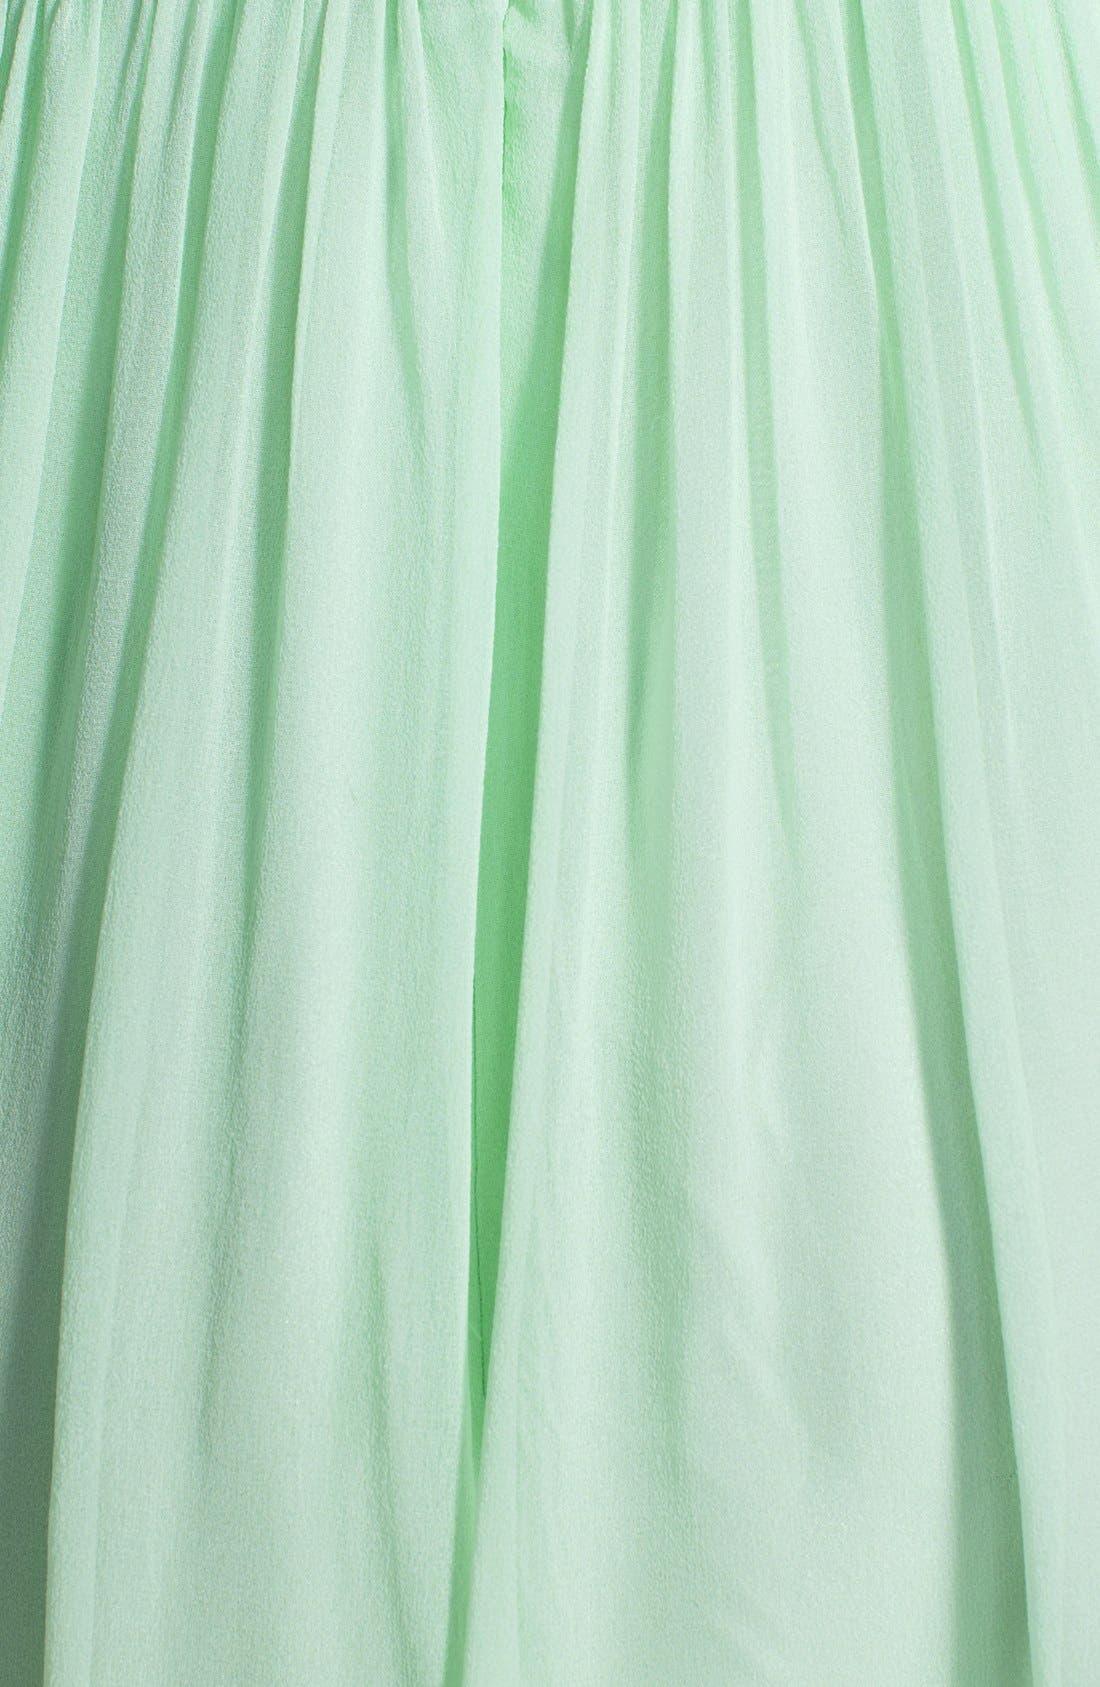 'Morgan' Strapless Silk Chiffon Dress,                             Alternate thumbnail 131, color,